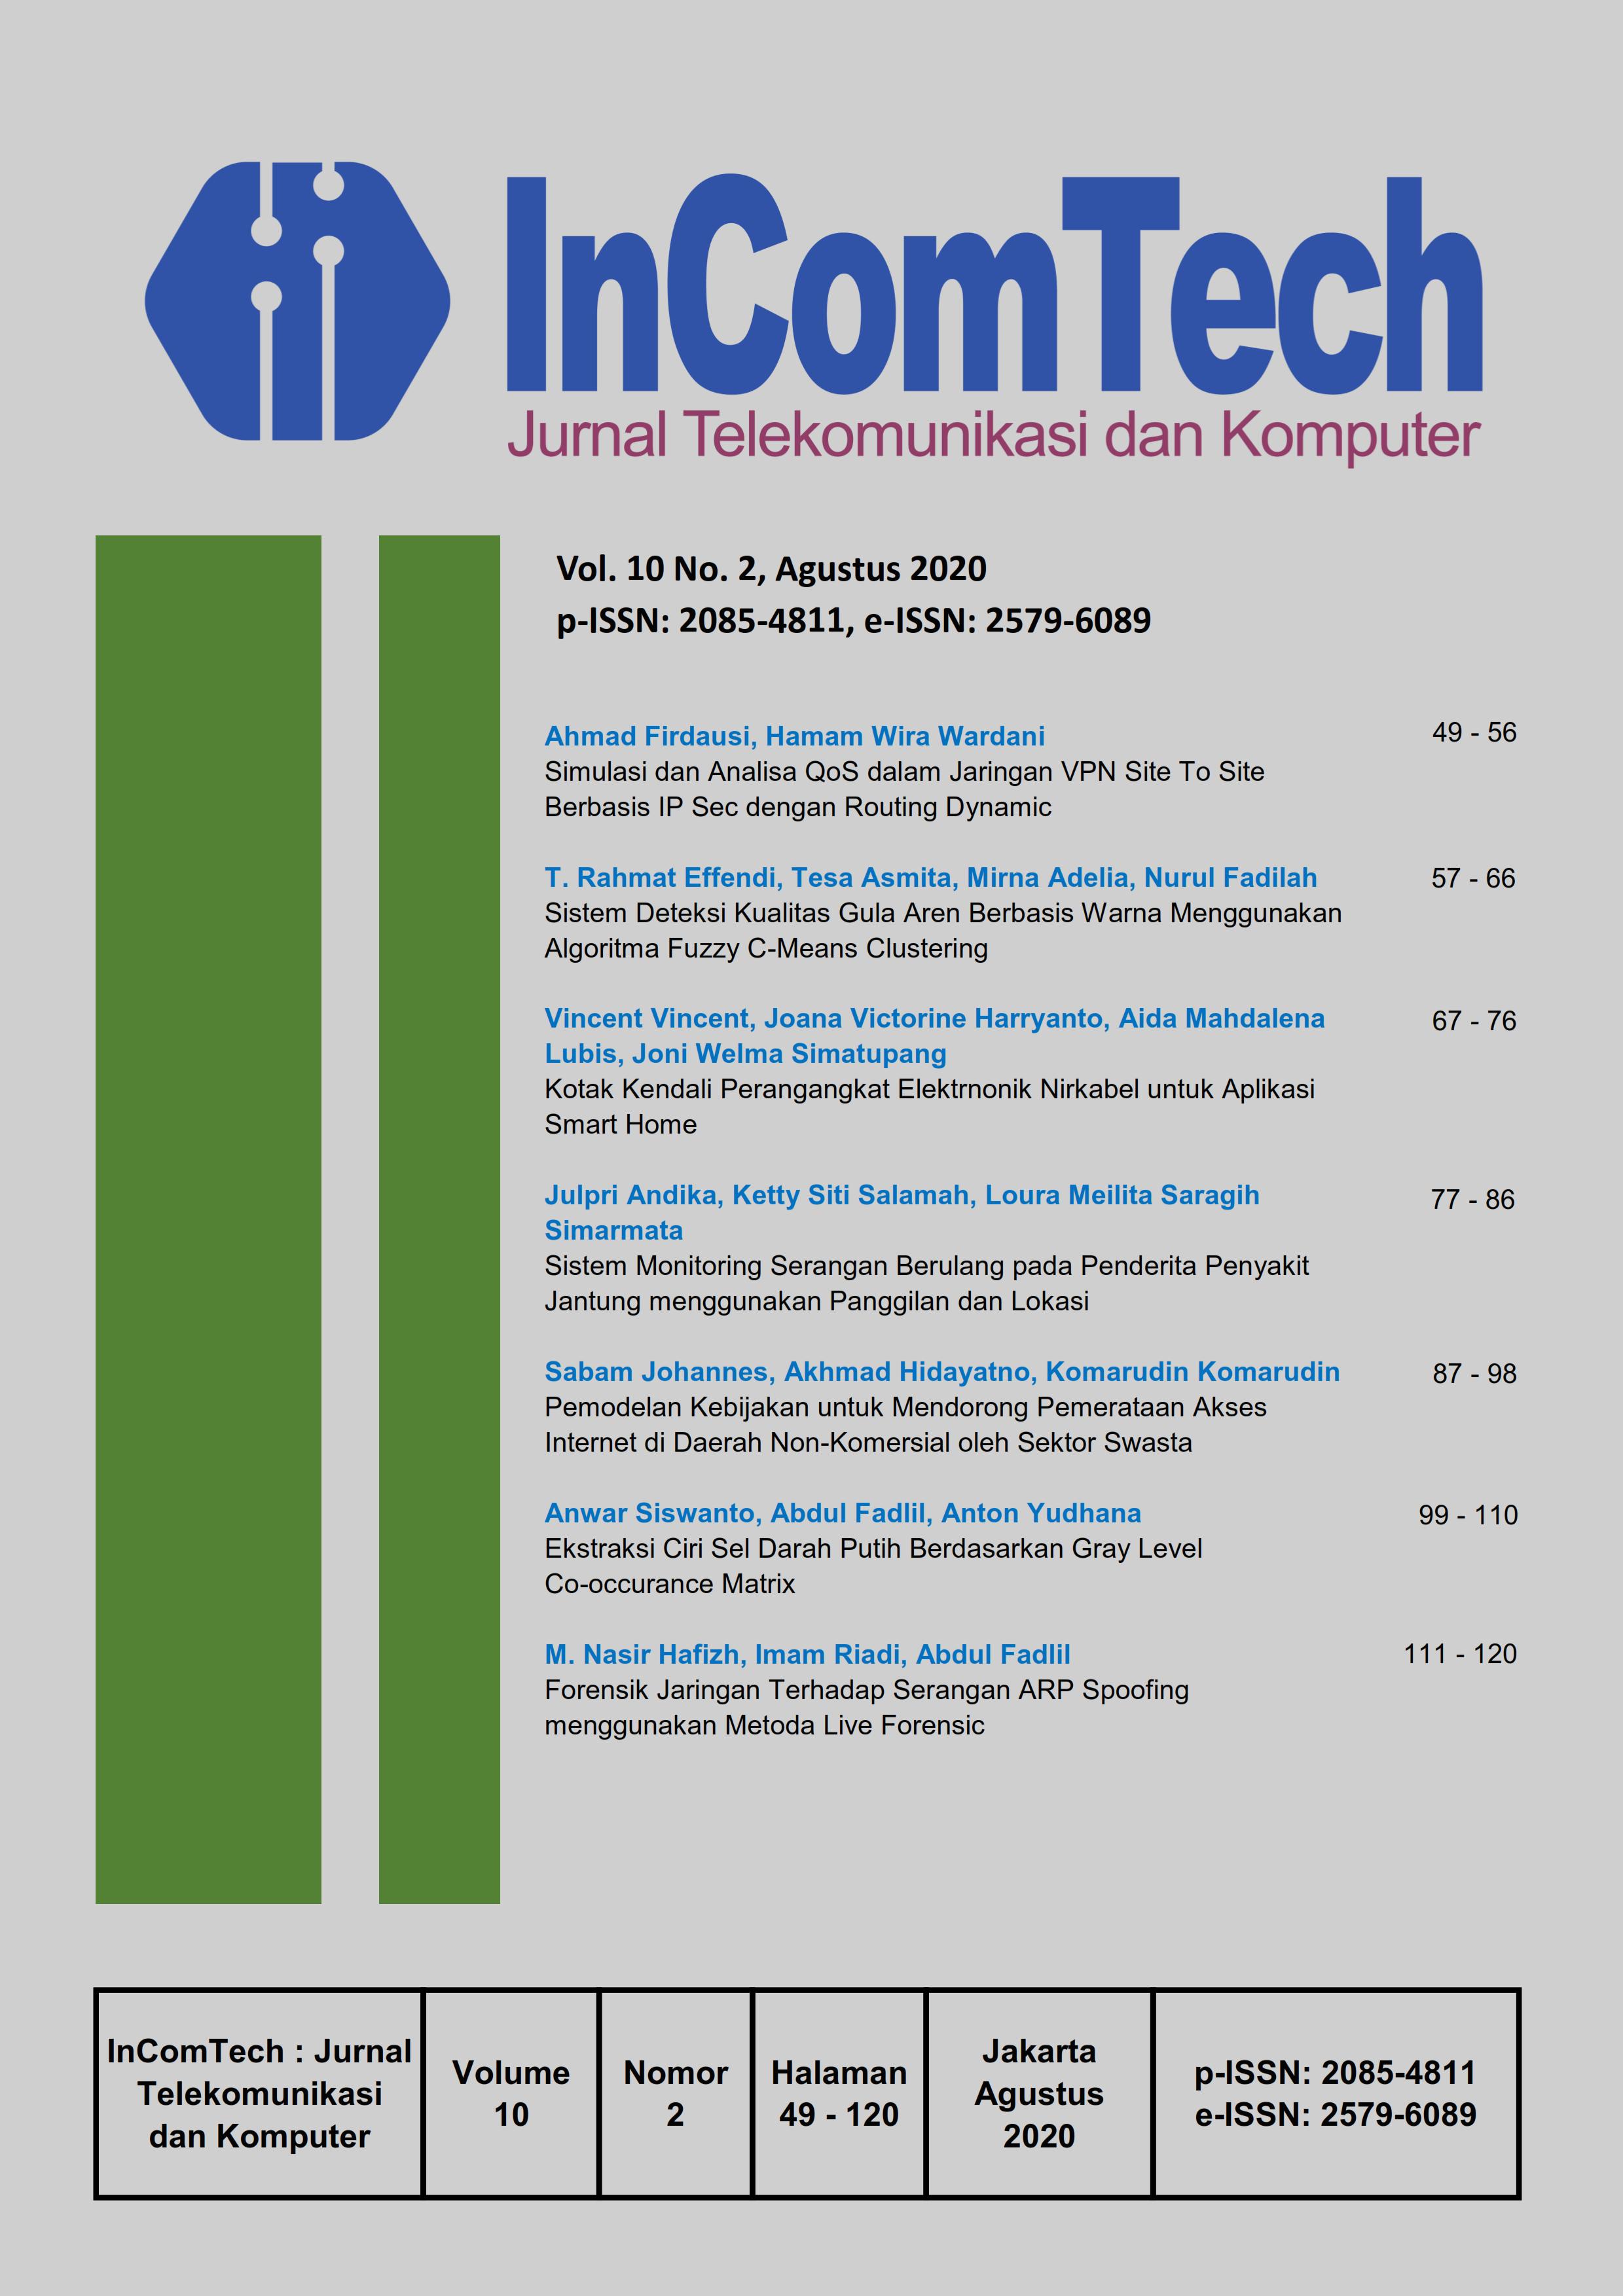 Incomtech Jurnal Telekomunikasi Dan Komputer